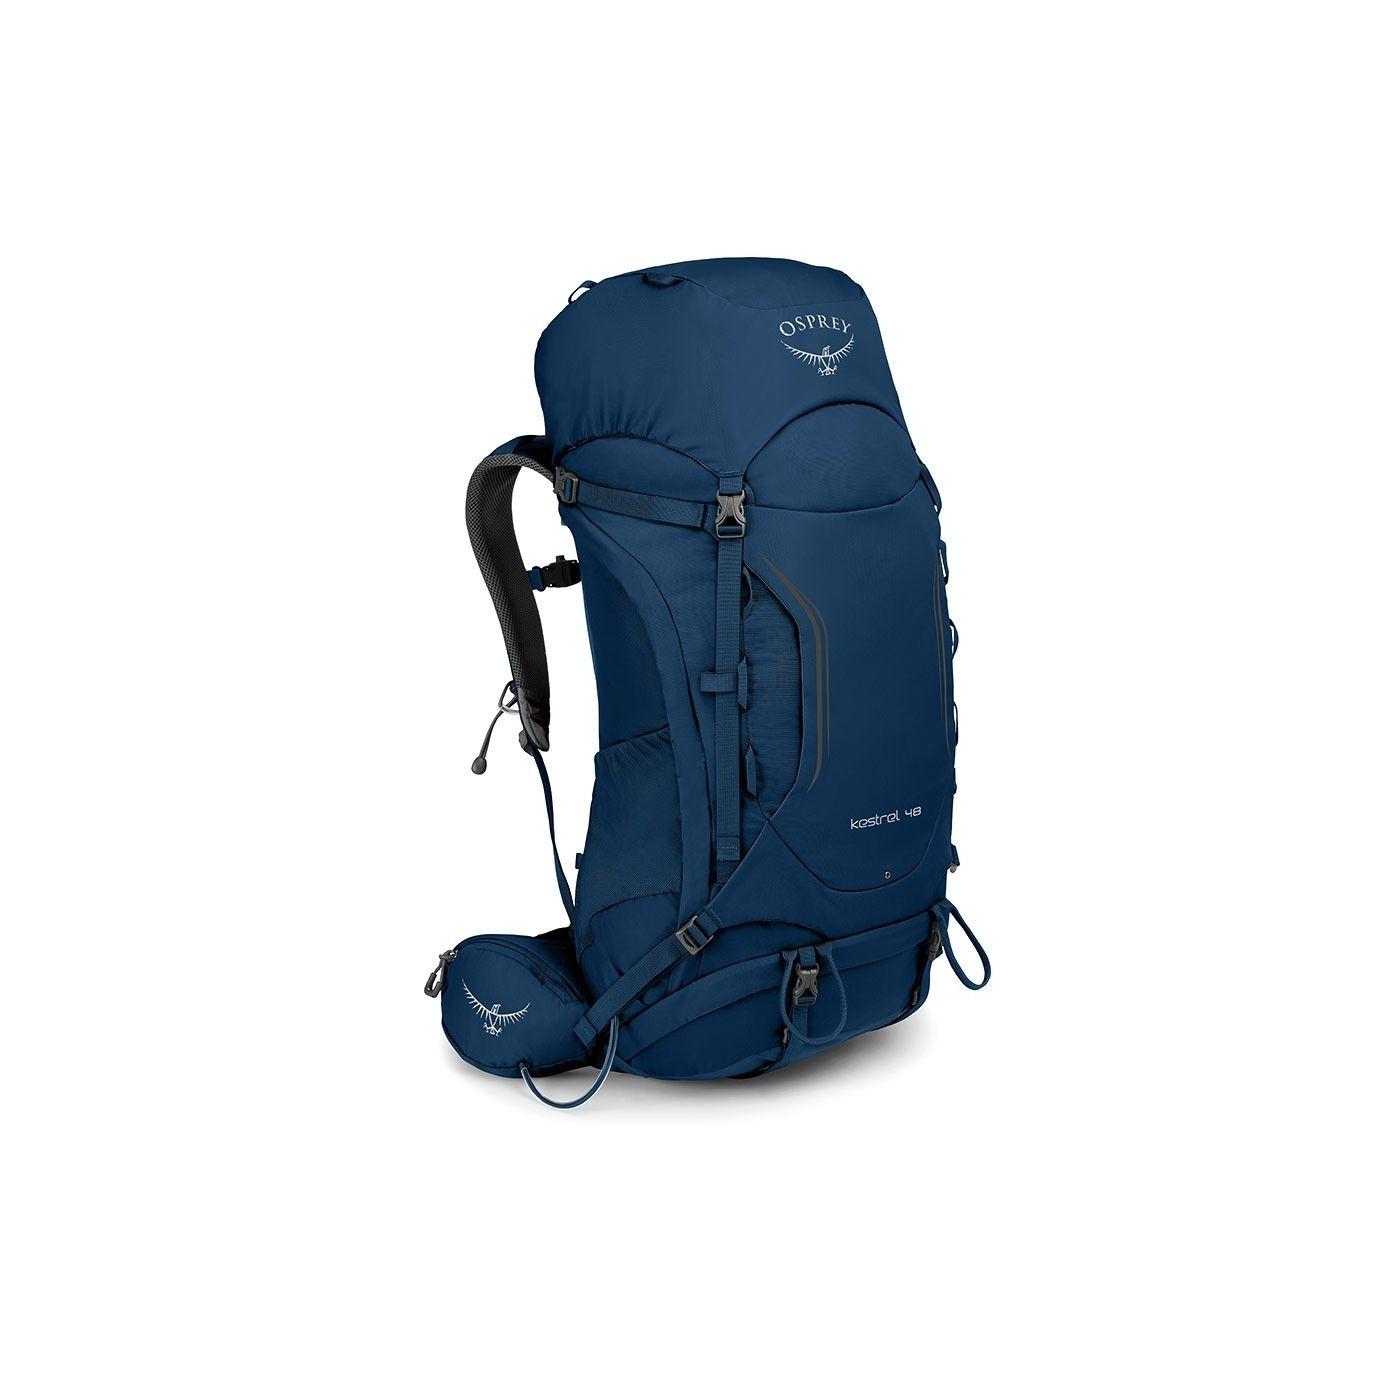 Turistický batoh Osprey Kestrel 48 II